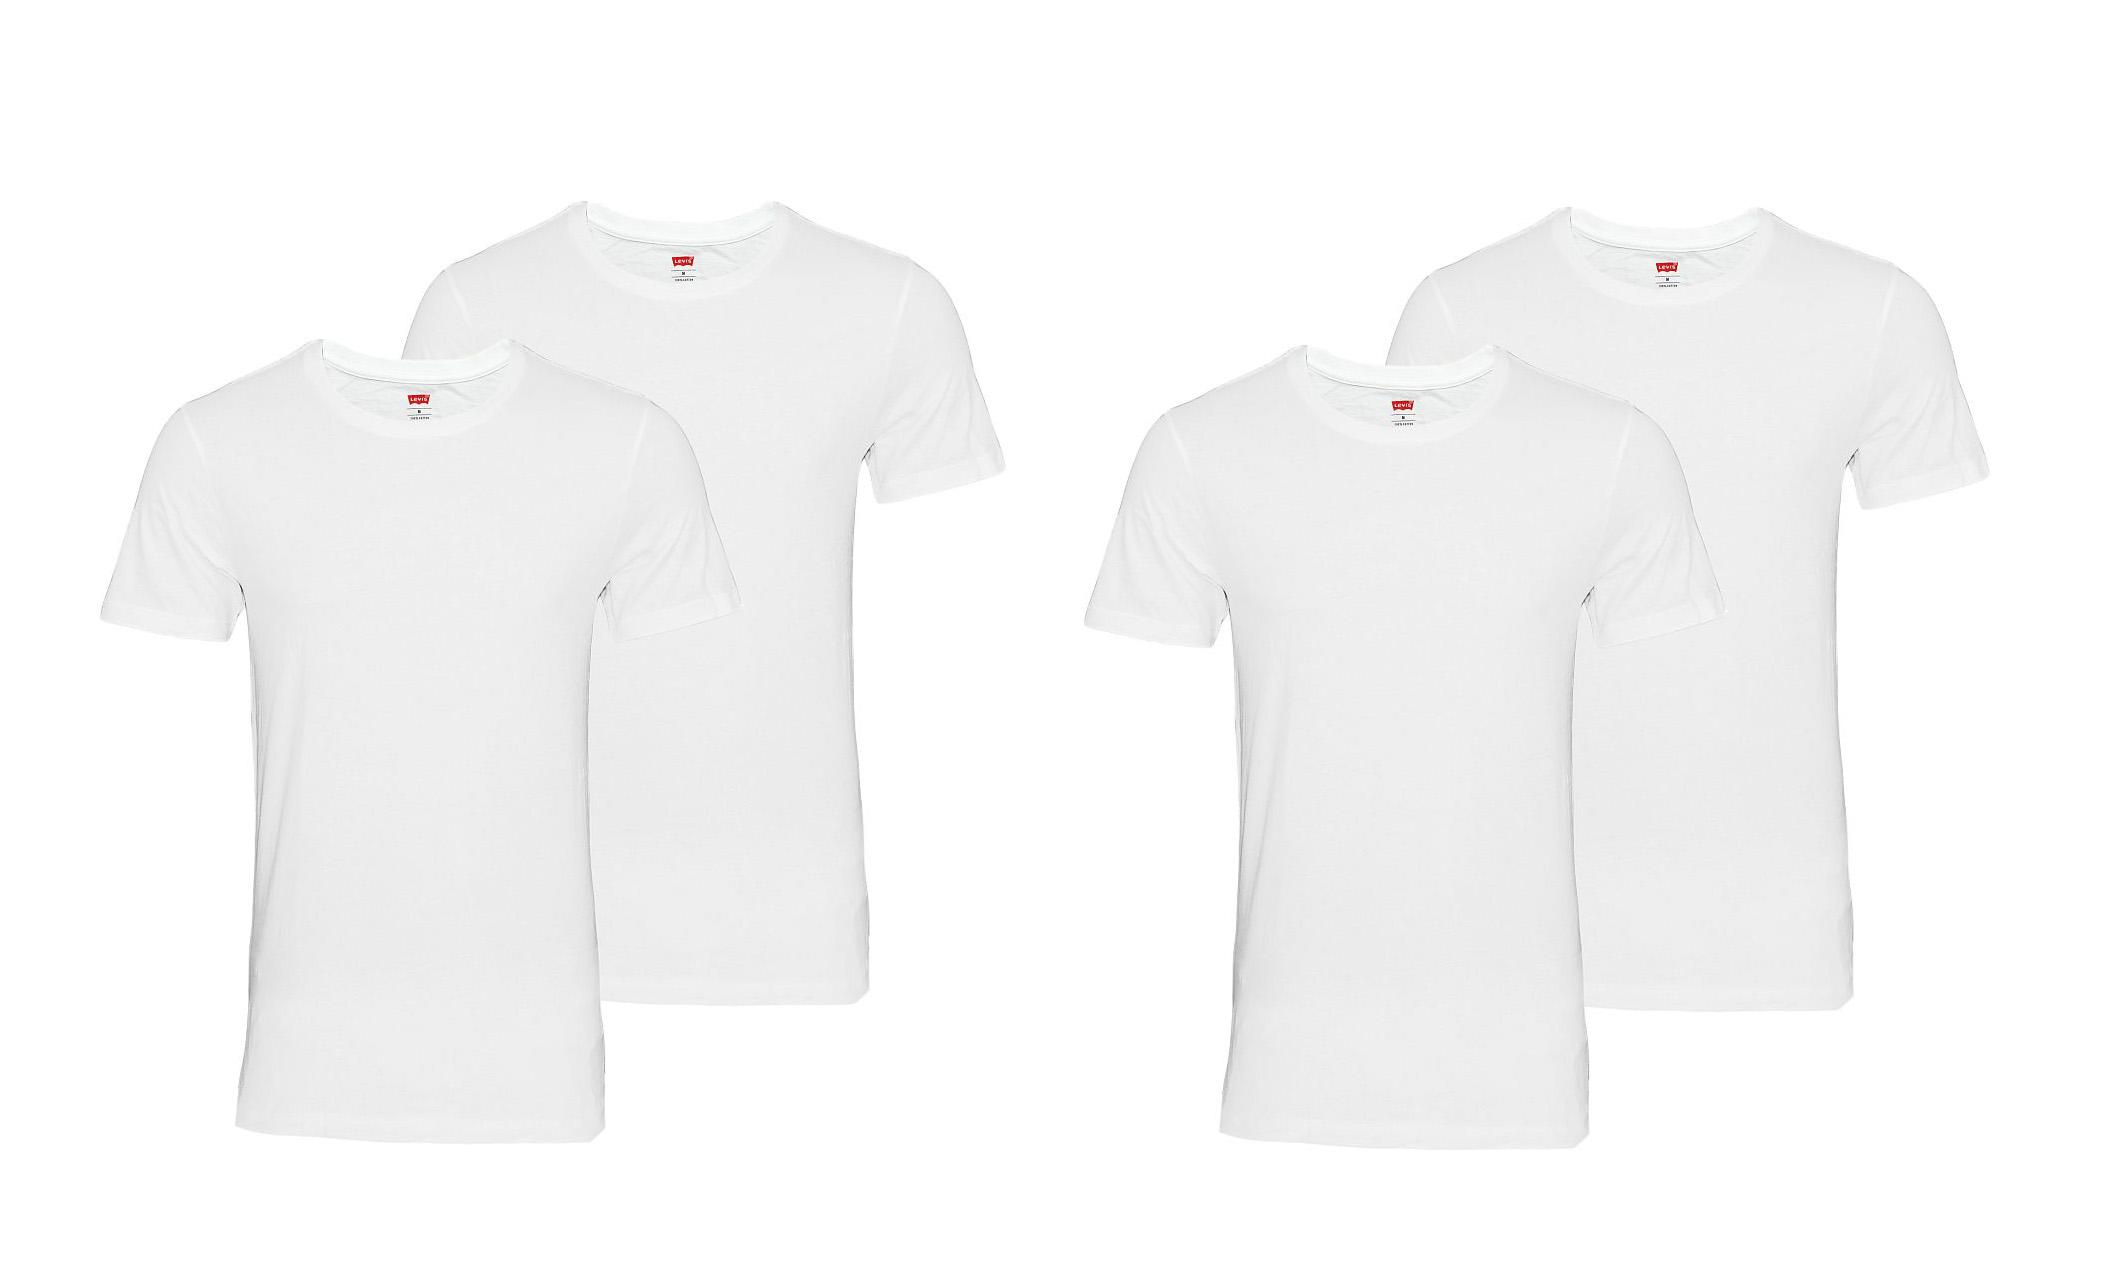 LEVIS Shirts 200SF 2 x 2er Pack T-Shirt Shirts White 945003001 300 SF17-LVSS2